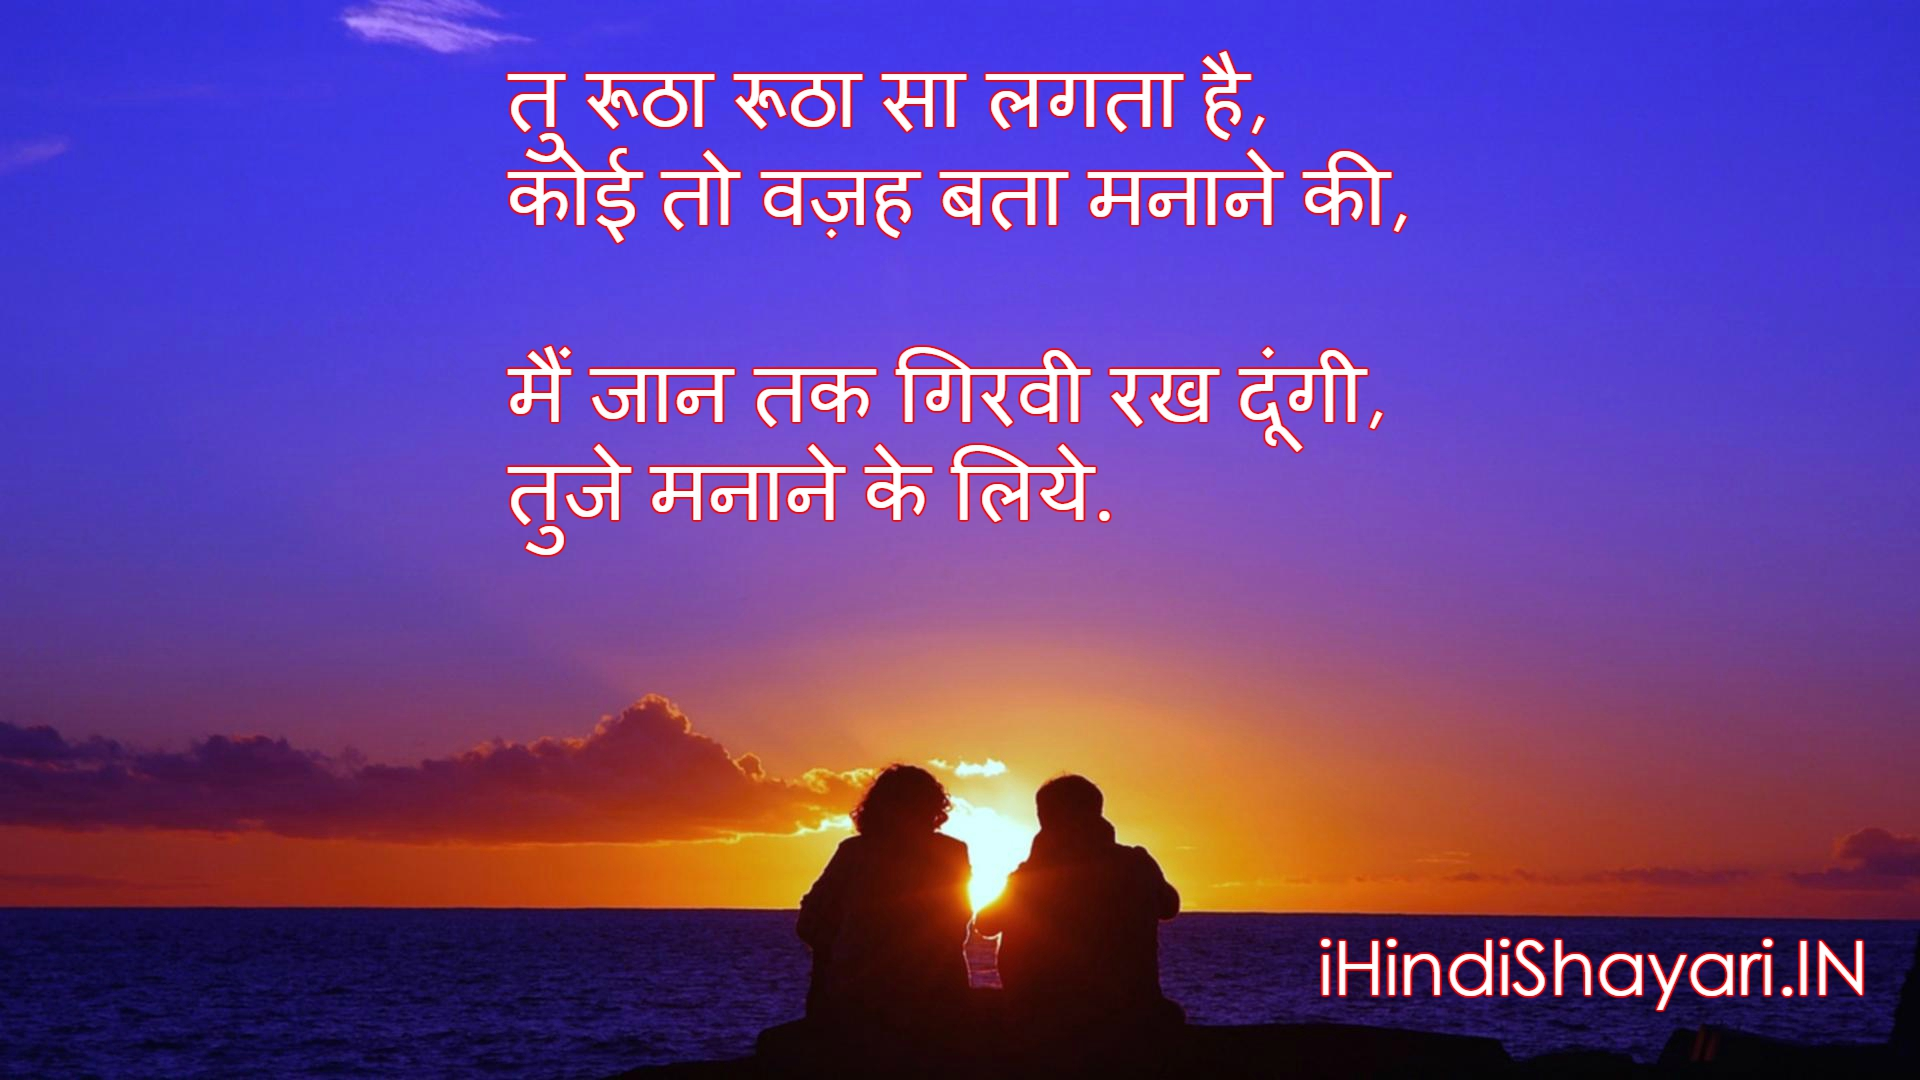 {TOP} Romantic Status for Whatsapp in Hindi - Hindi Shayari